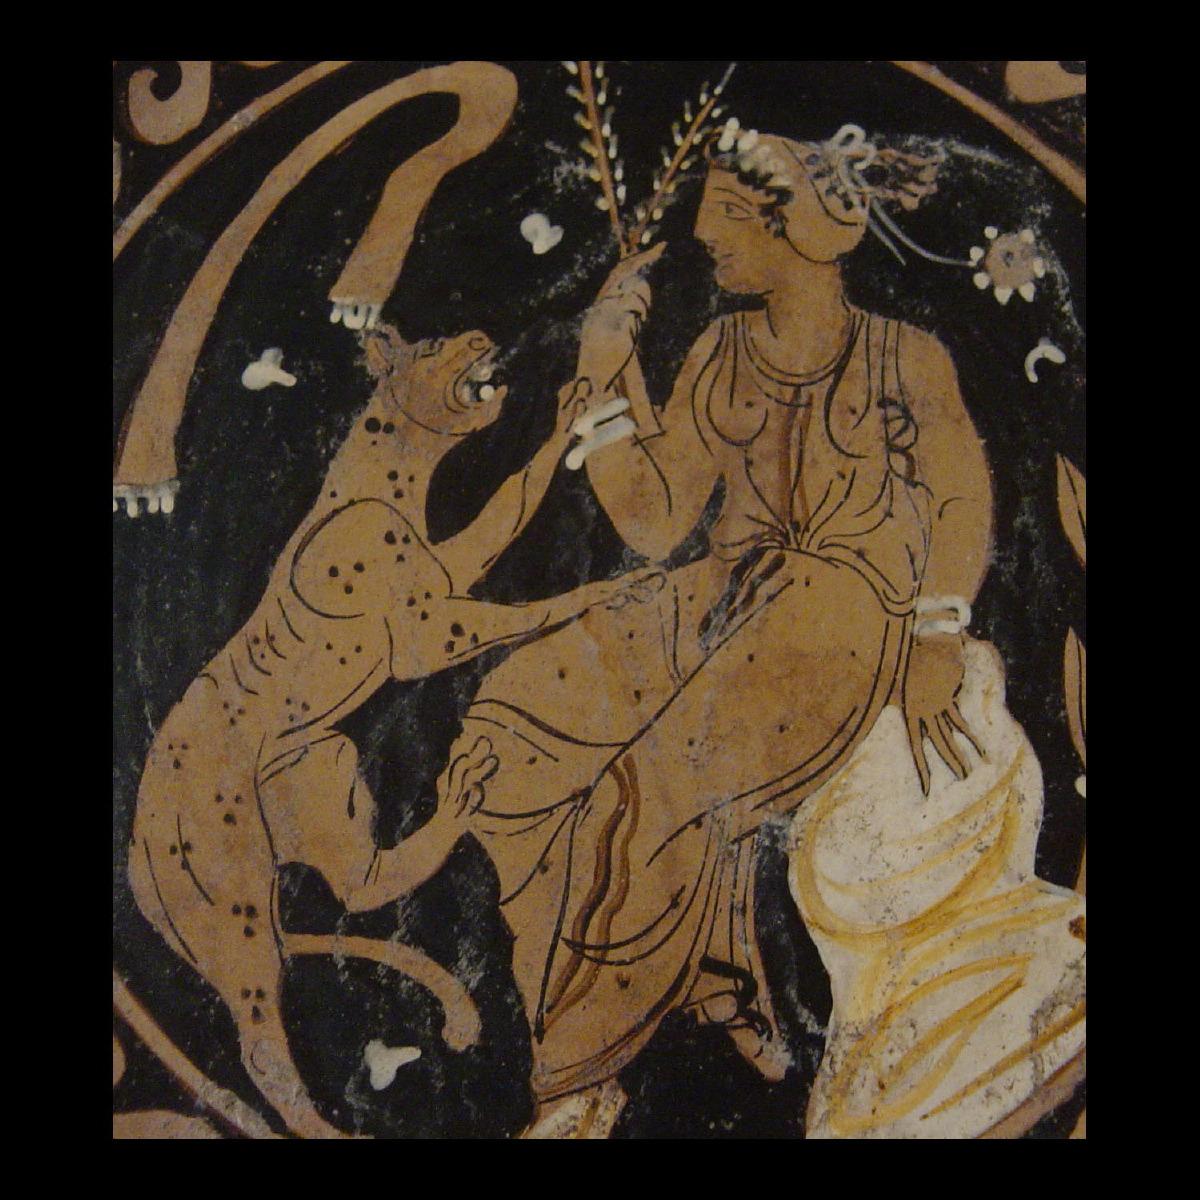 Photo of plate-apulia-cat-galerie-golconda-archeology